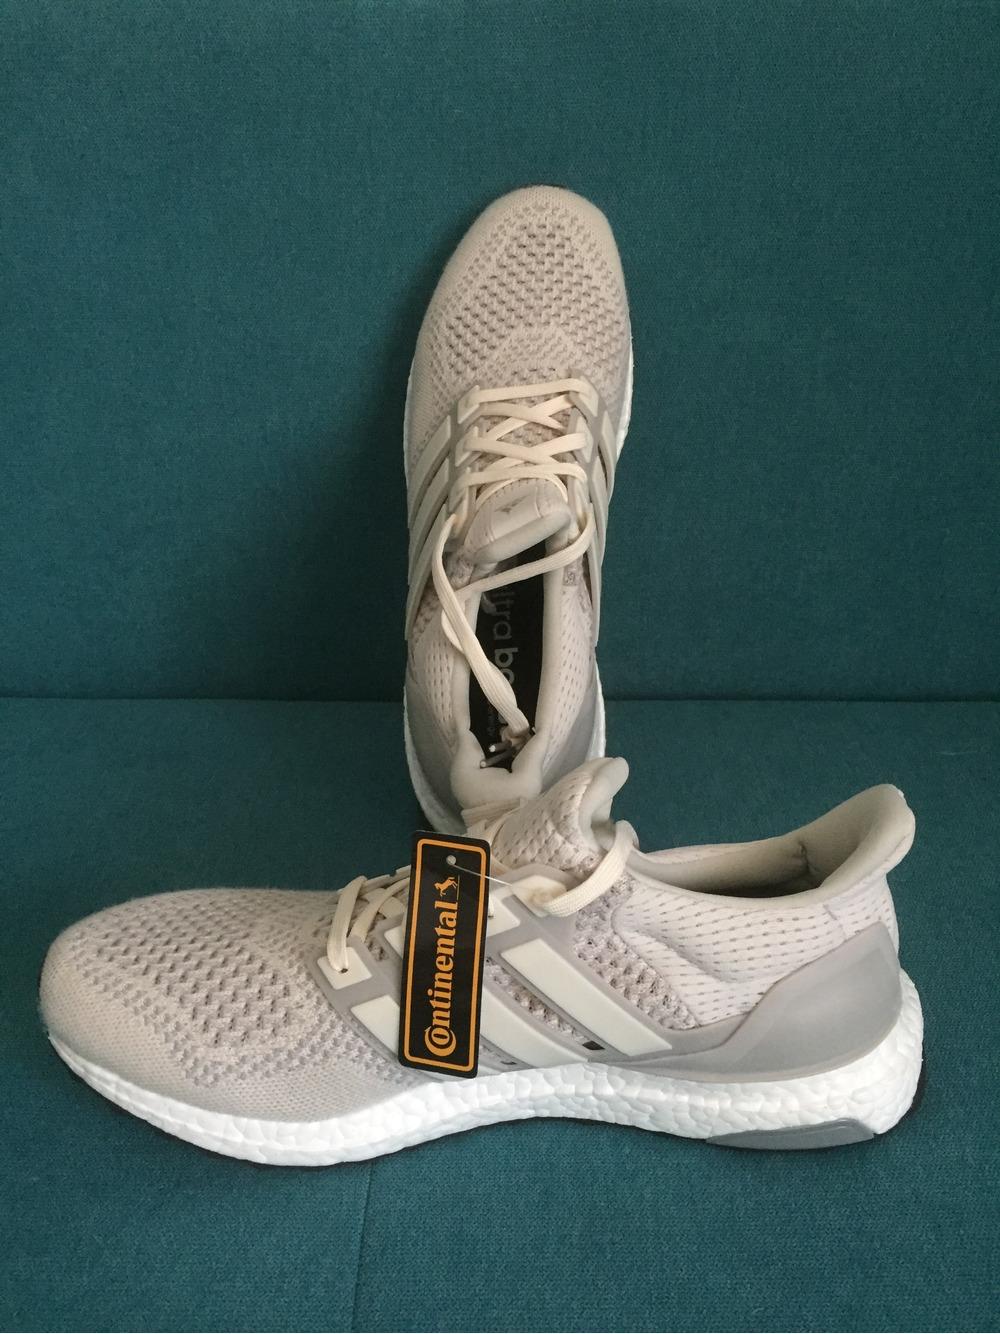 Adidas Ultra Boost Tan Cream